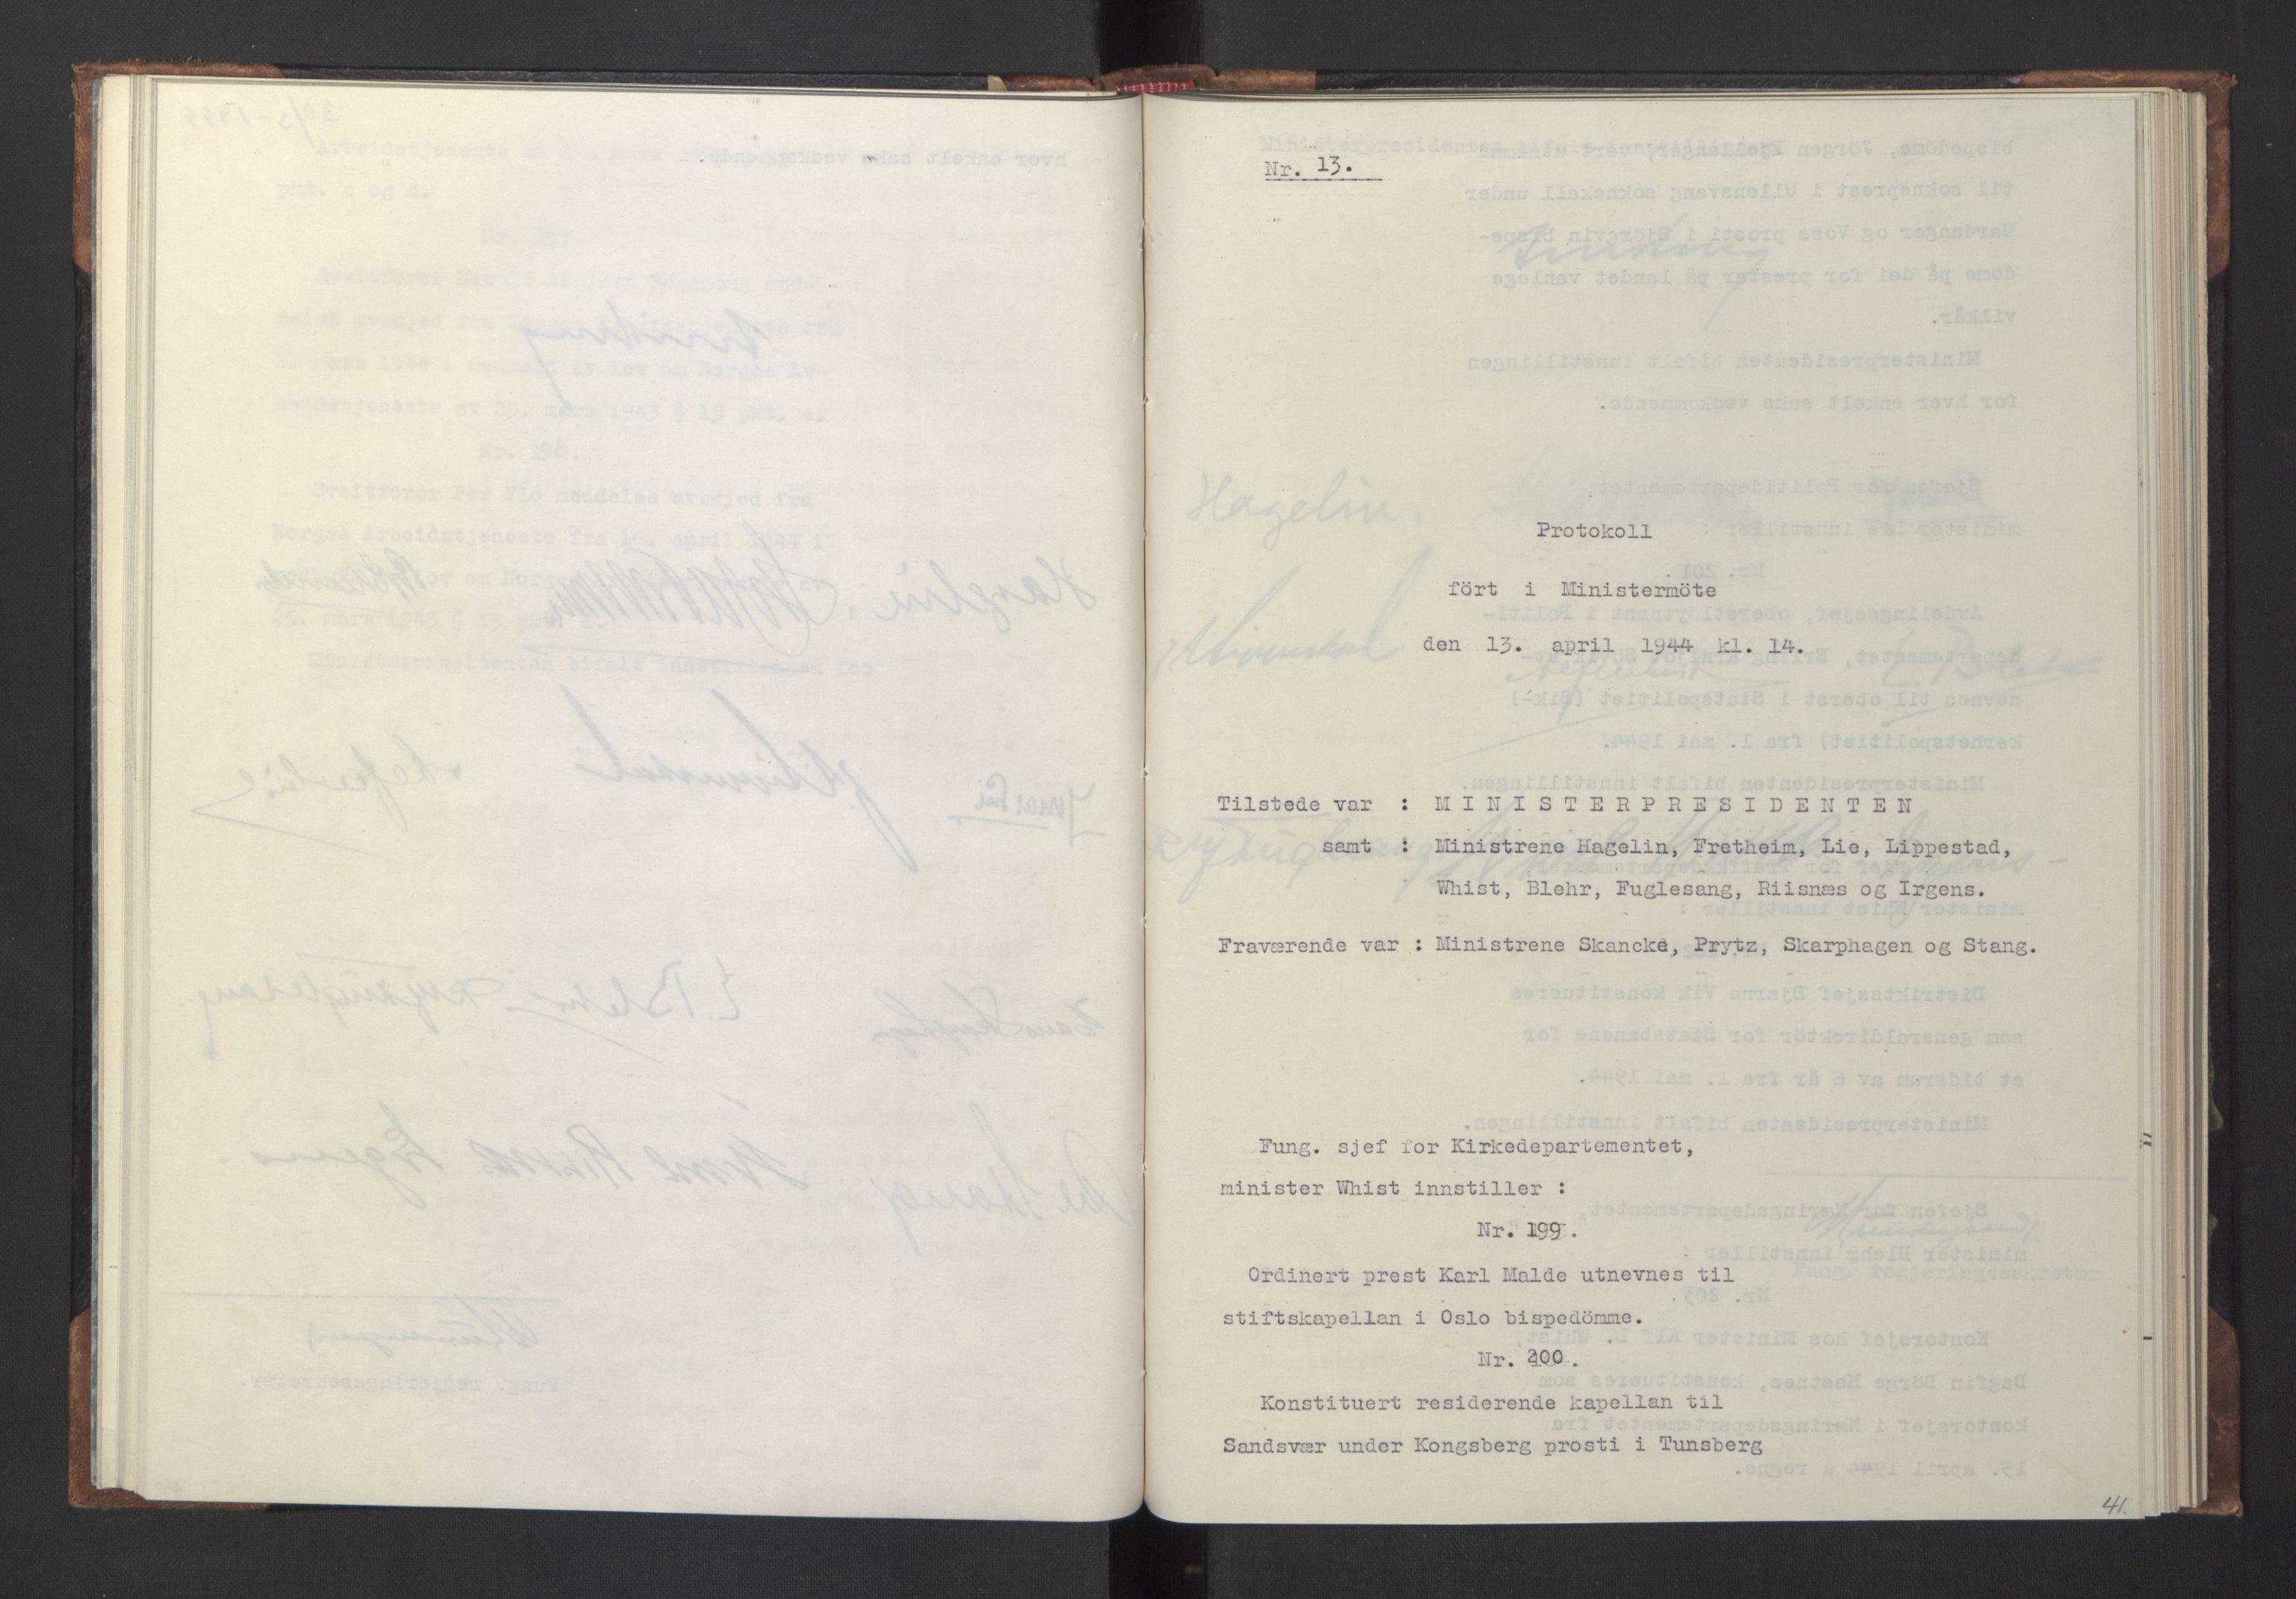 RA, NS-administrasjonen 1940-1945 (Statsrådsekretariatet, de kommisariske statsråder mm), D/Da/L0005: Protokoll fra ministermøter, 1944, s. 40b-41a